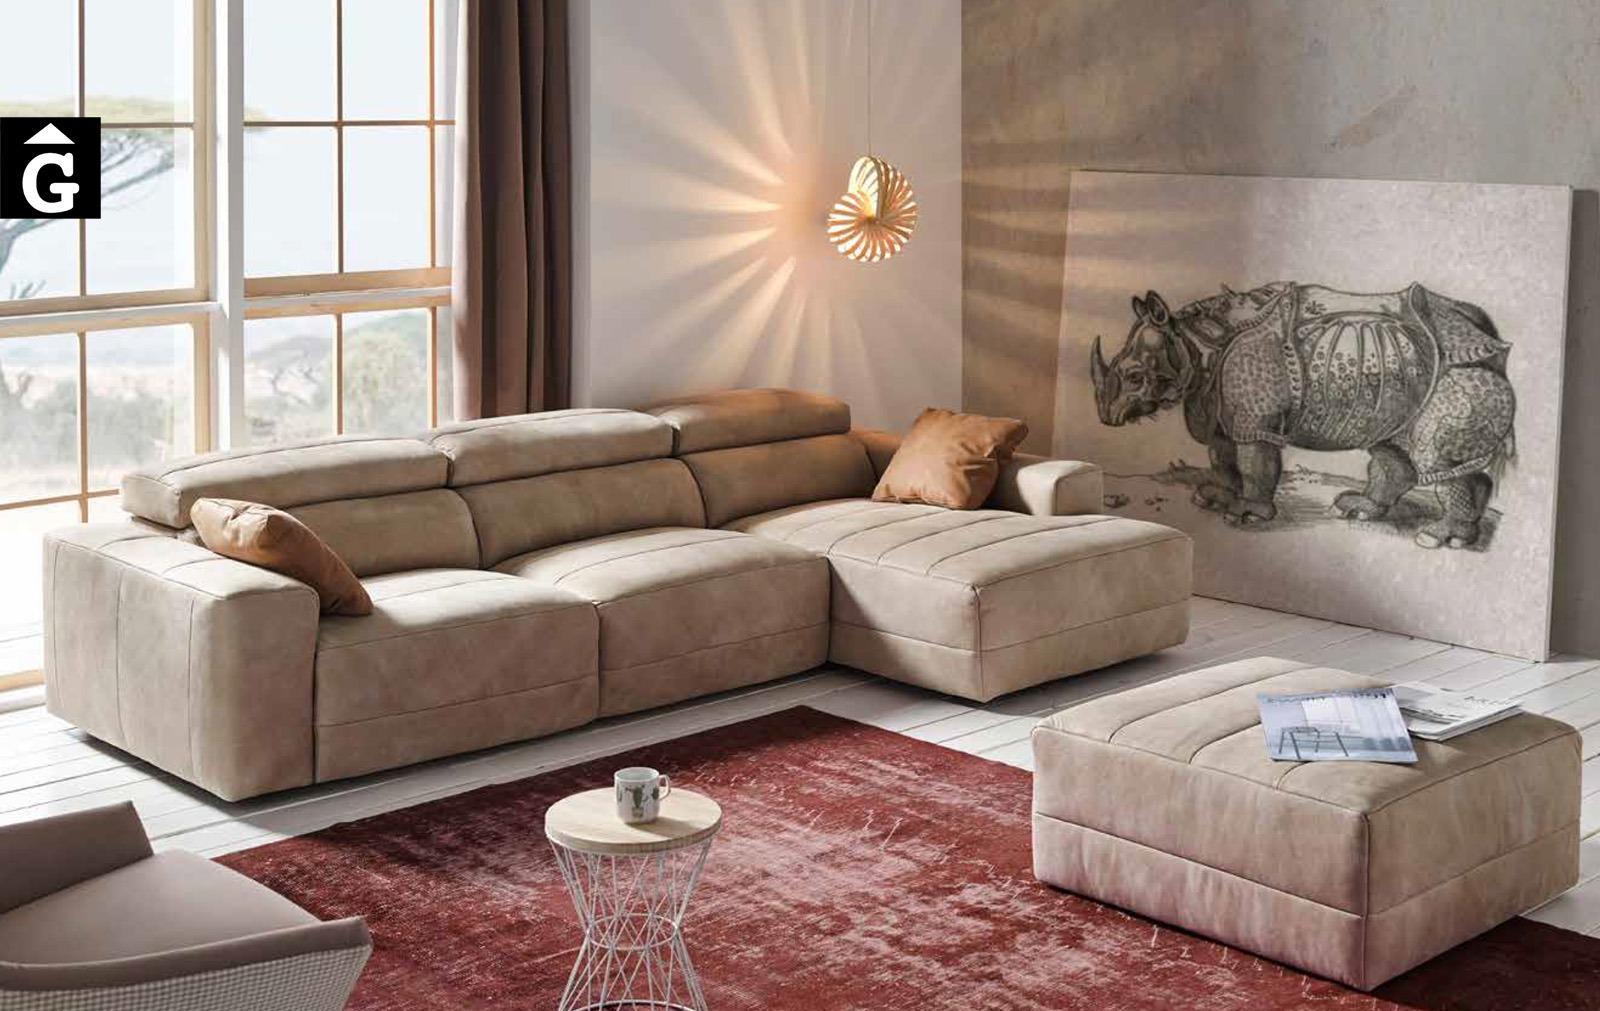 Yaiza sofa 1 Pedro Ortiz tapisseria by mobles Gifreu sofas relax